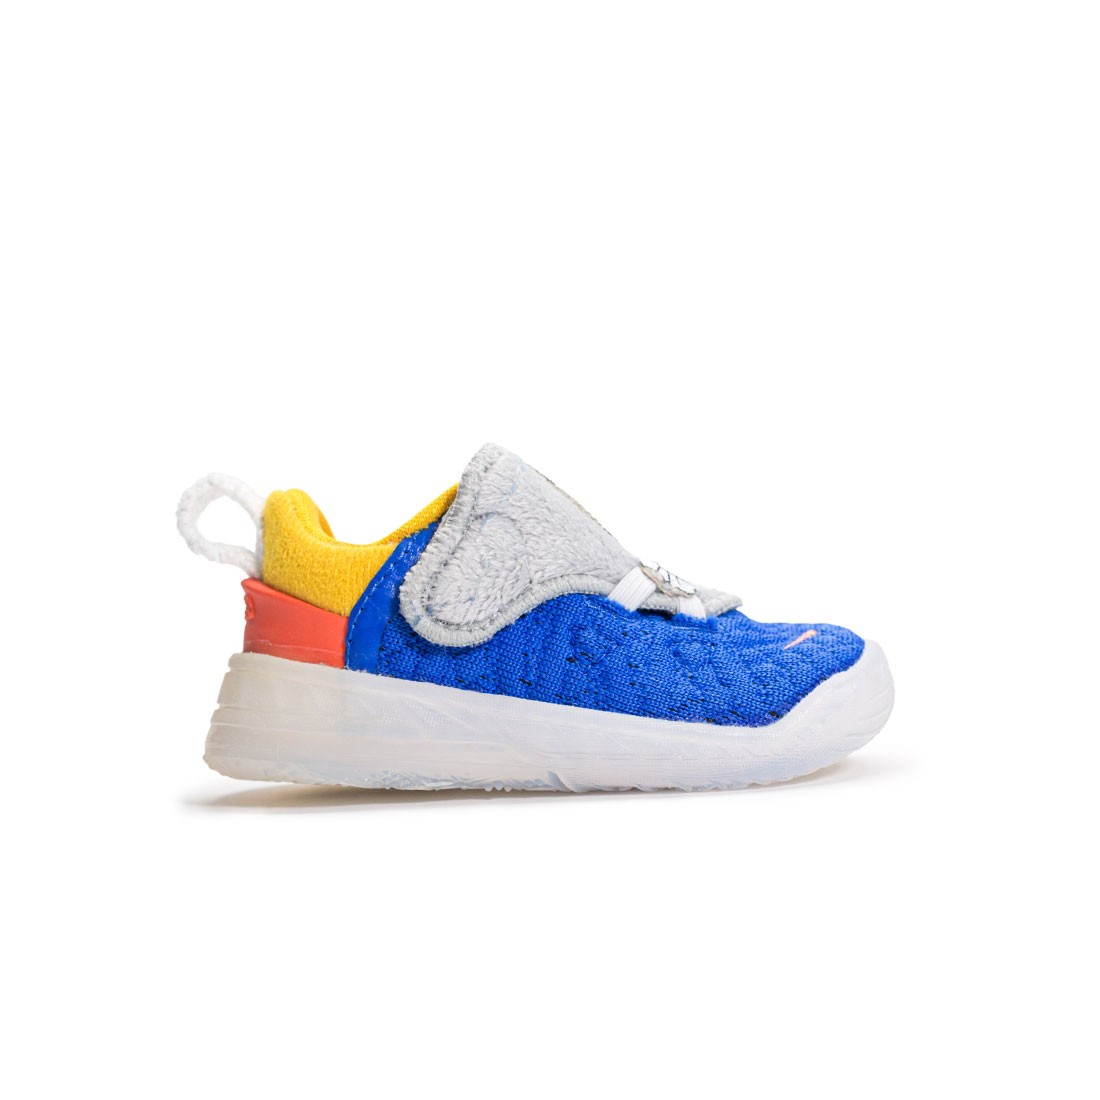 Nike Toddlers Lebron Xviii Se (Tdv) (hyper royal / crimson bliss-lt smoke grey)